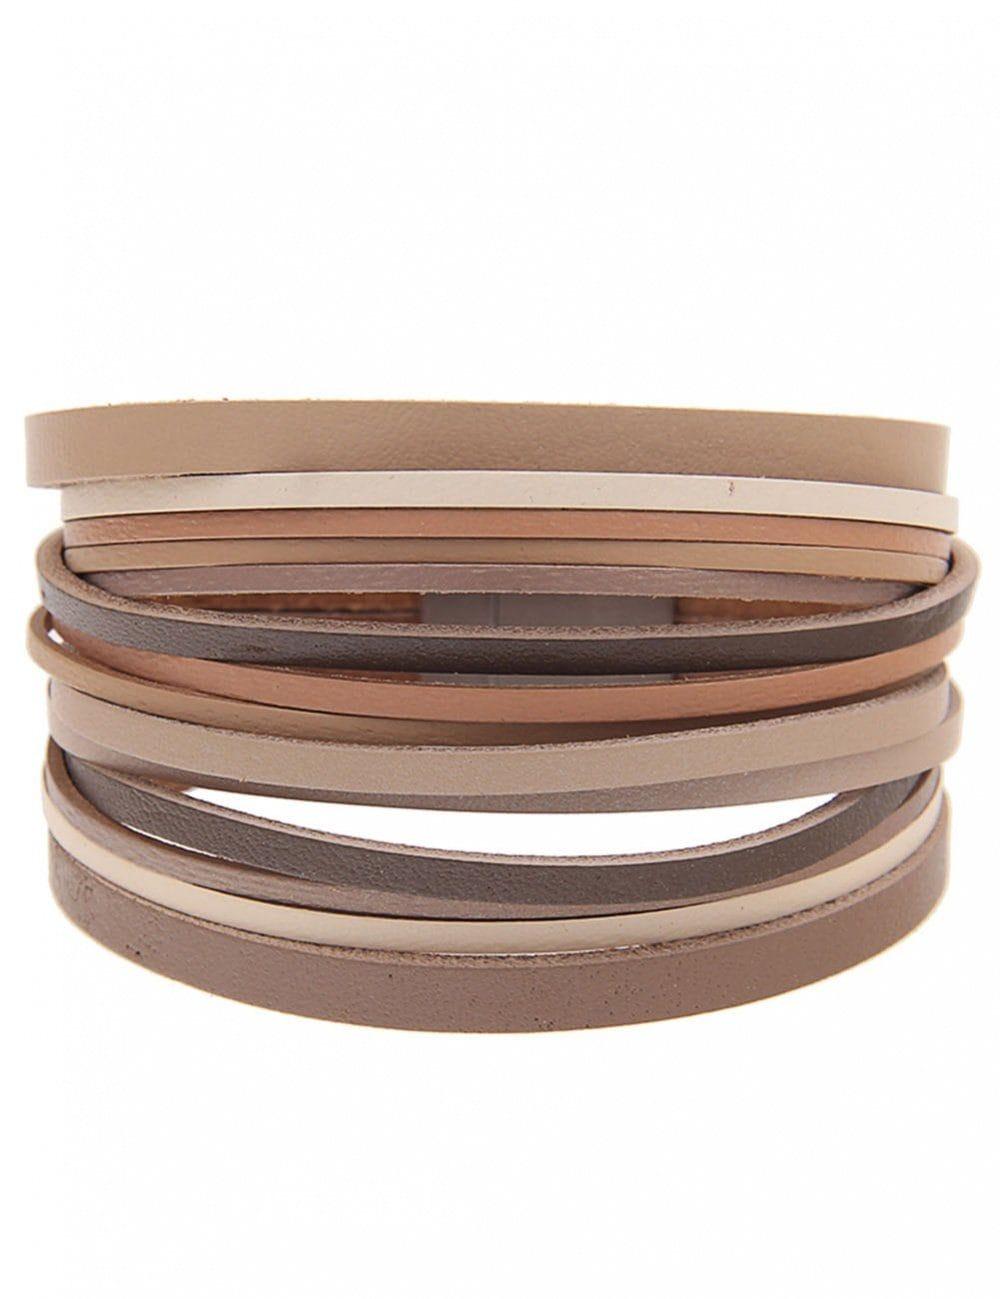 leslii Armband, mit Magnetverschluss braun Damen Armband Armbänder Schmuck 4250980361066